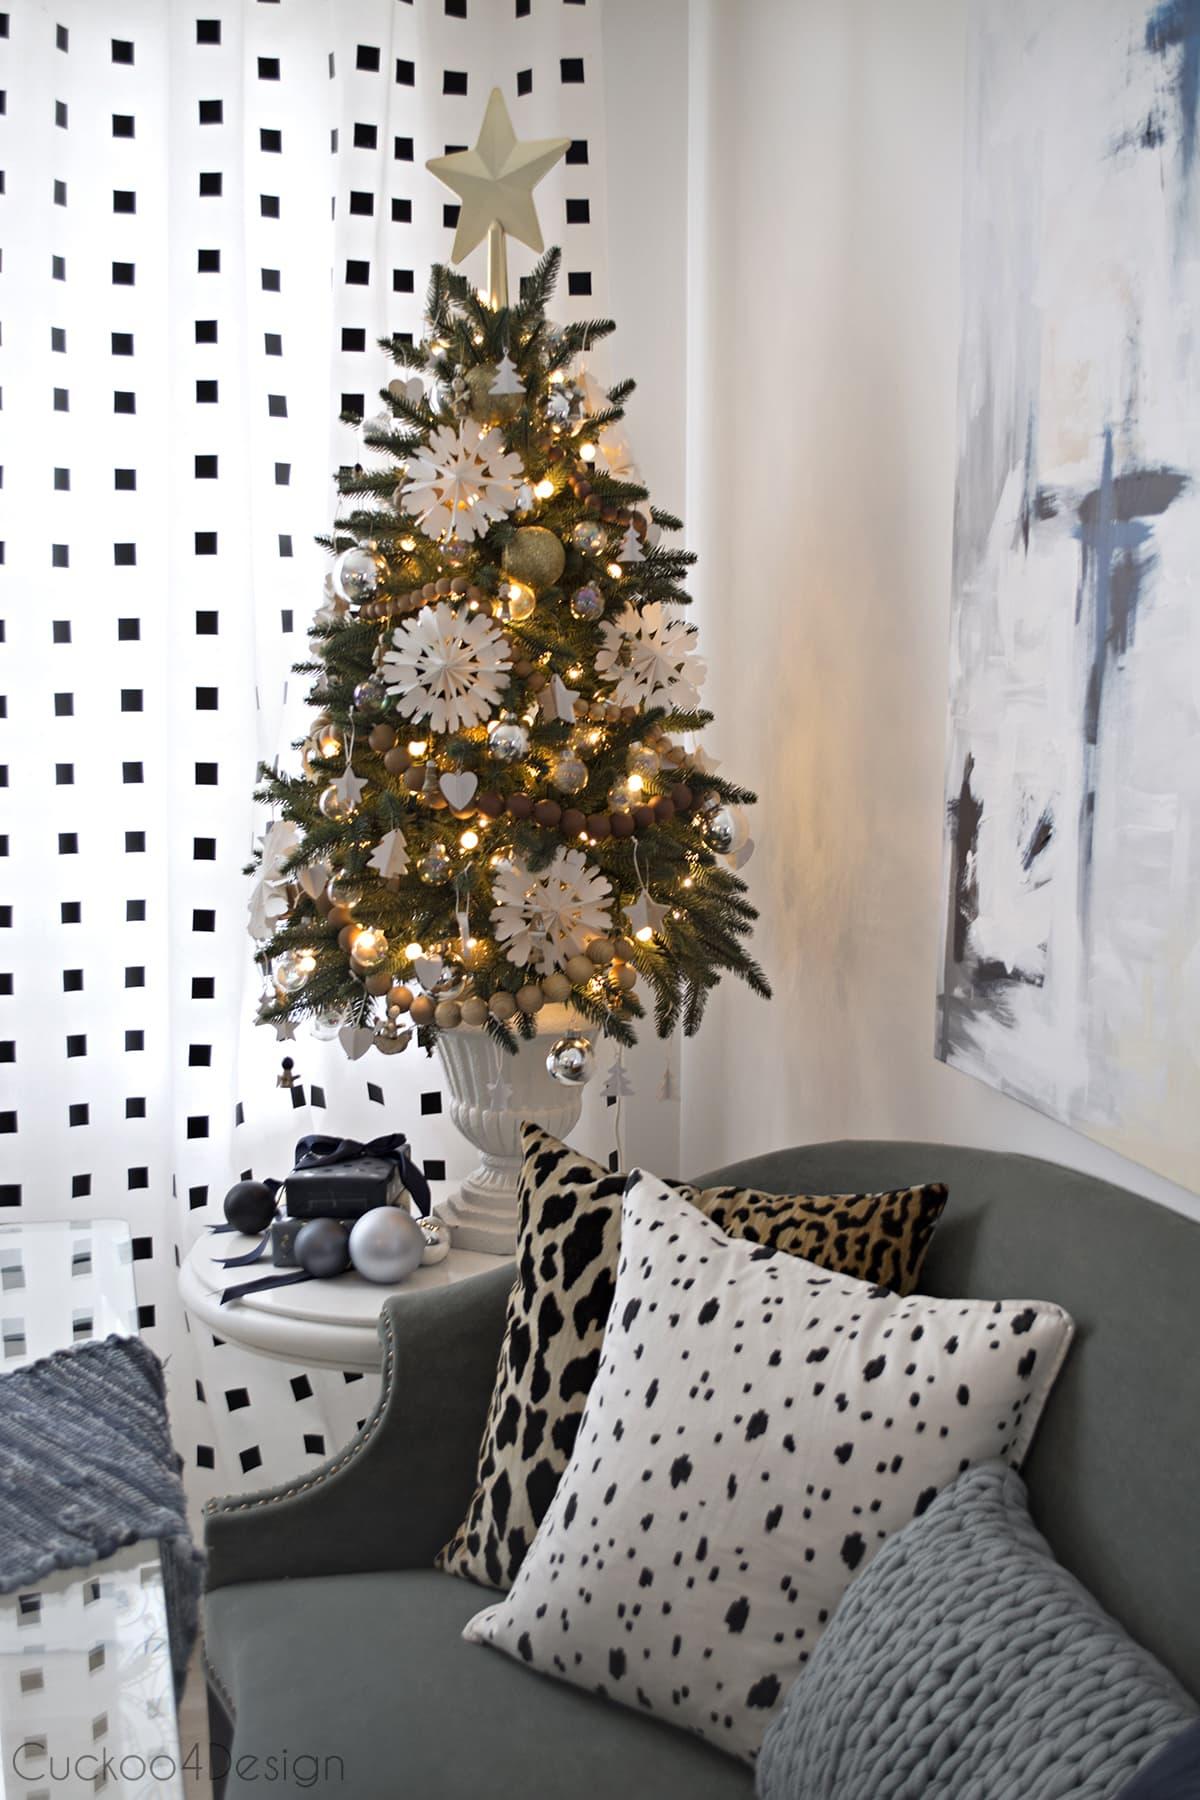 cuckoo4design_christmas_74